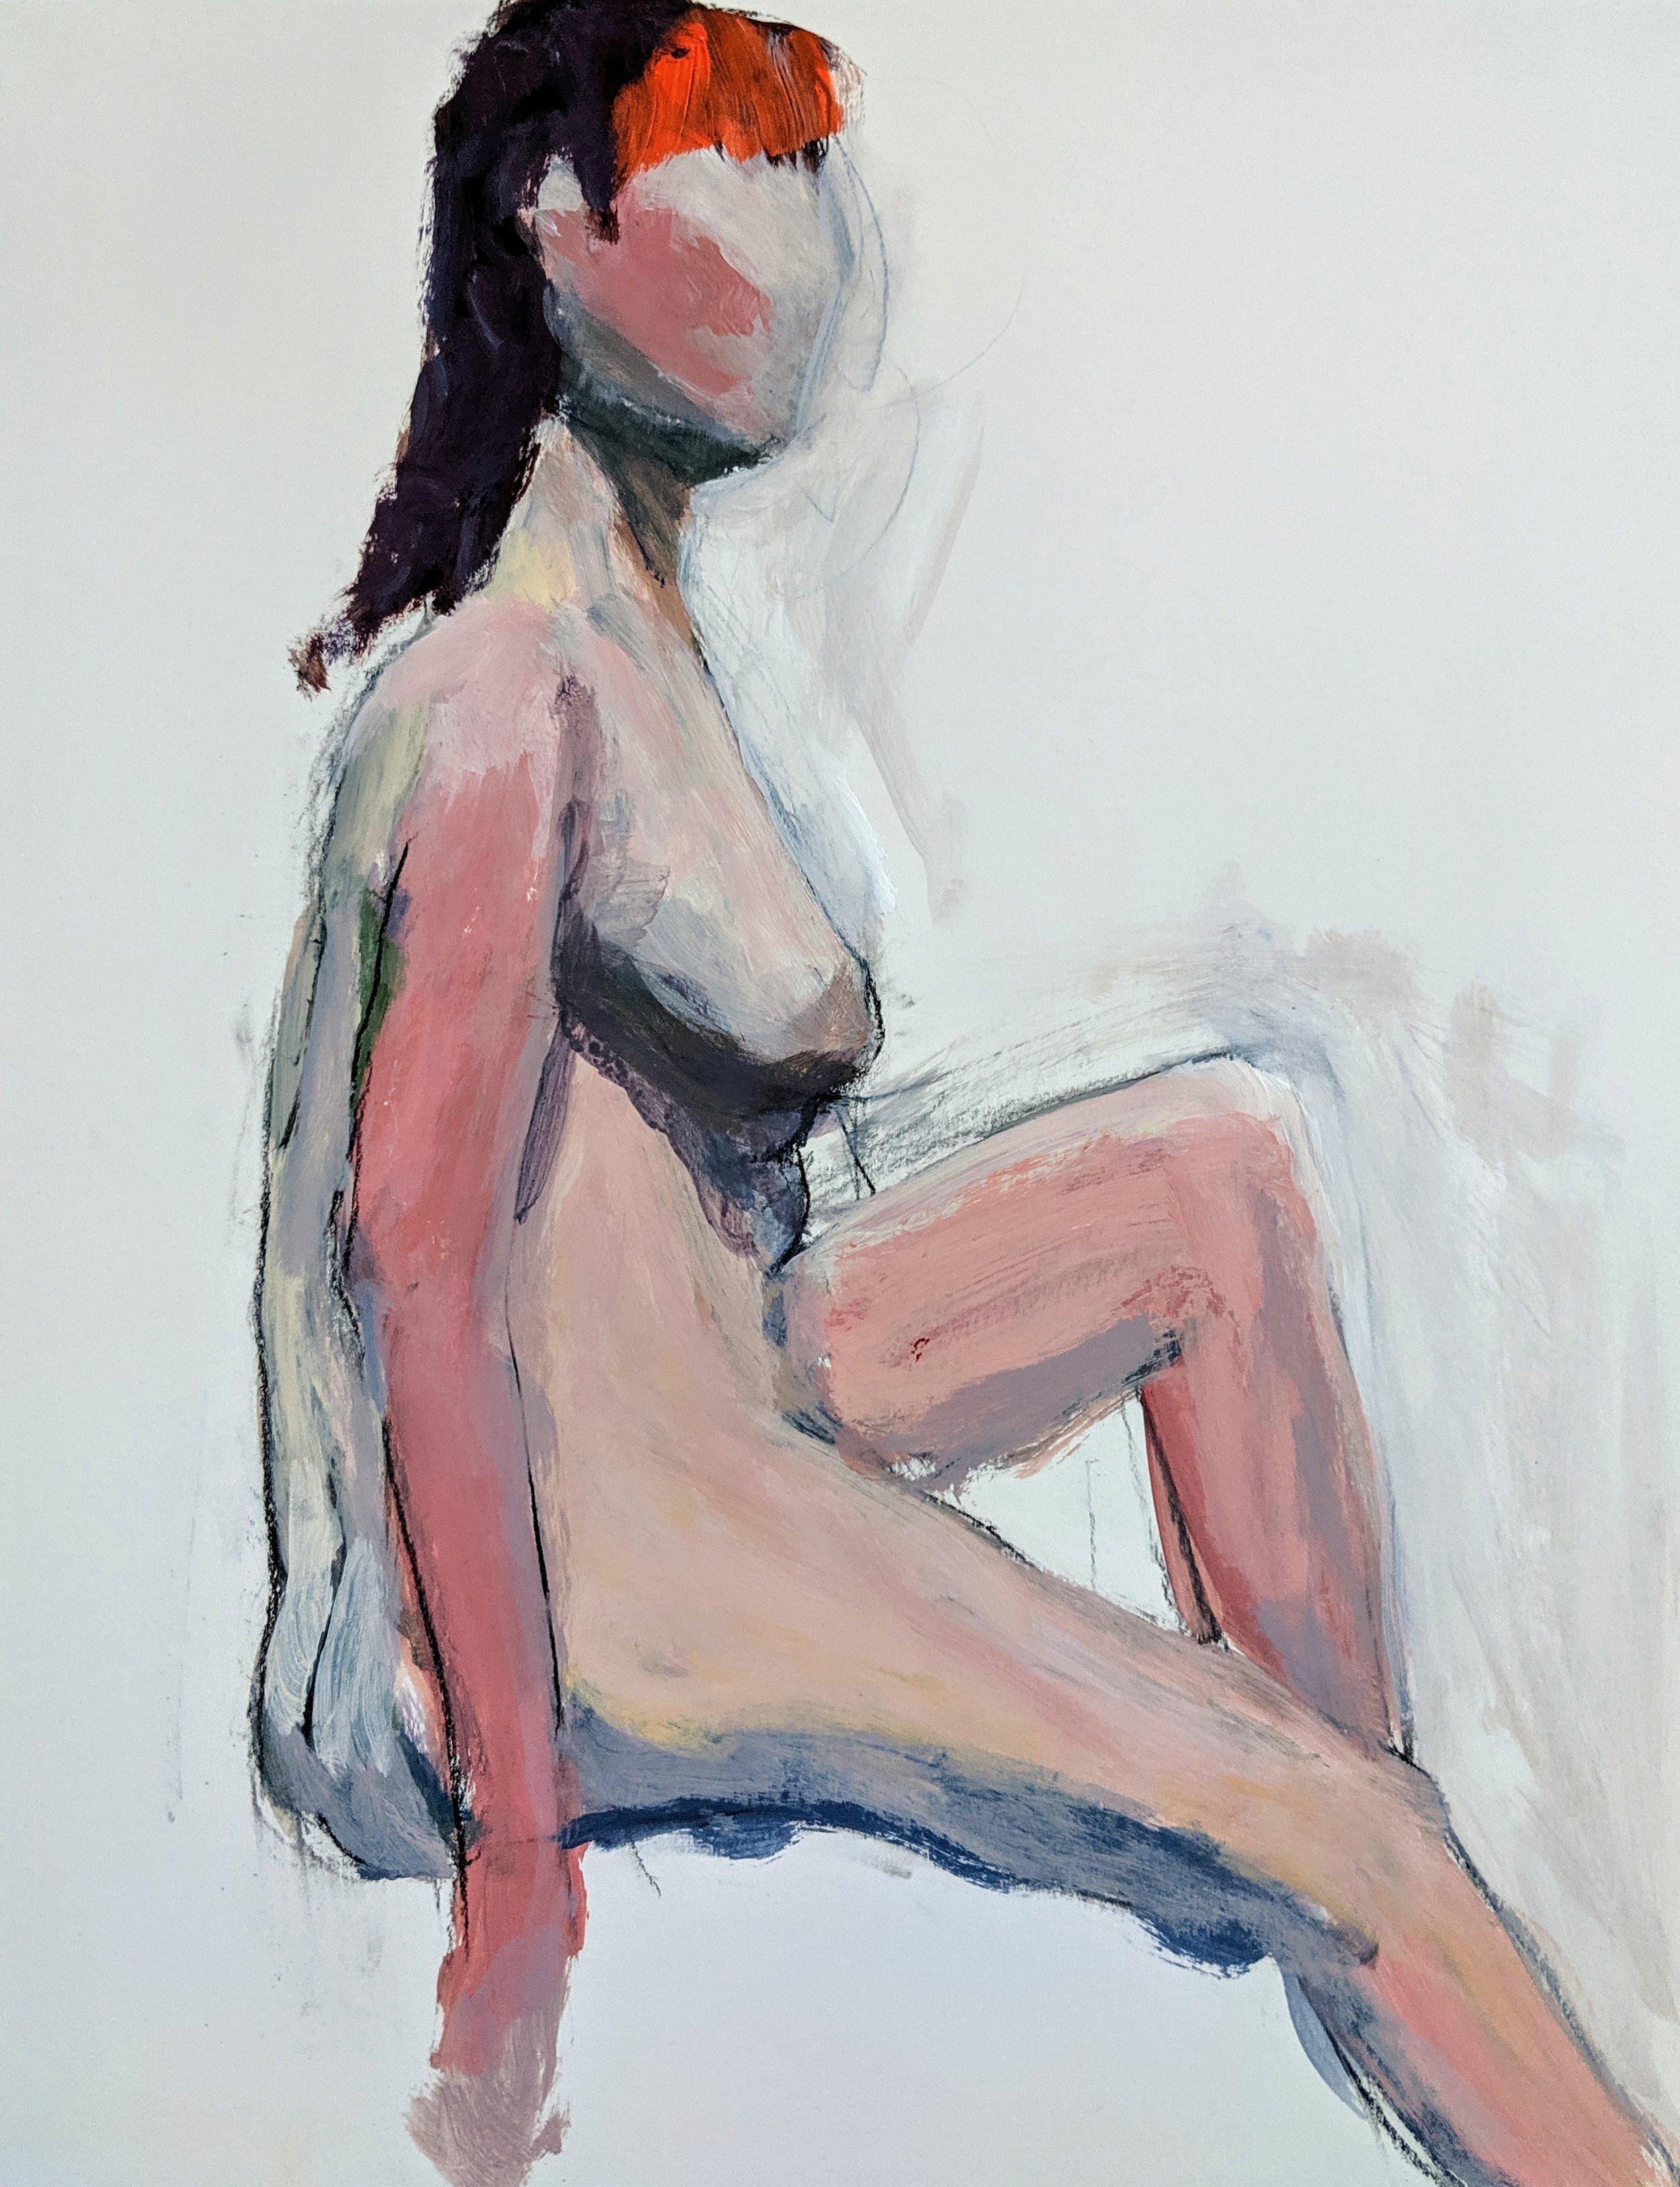 ©2019 Gail Reisman  | Figure Painting & Drawing Workshop, San Luis Obispo County (Arroyo Grande, CA) | David Limrite, Instructor